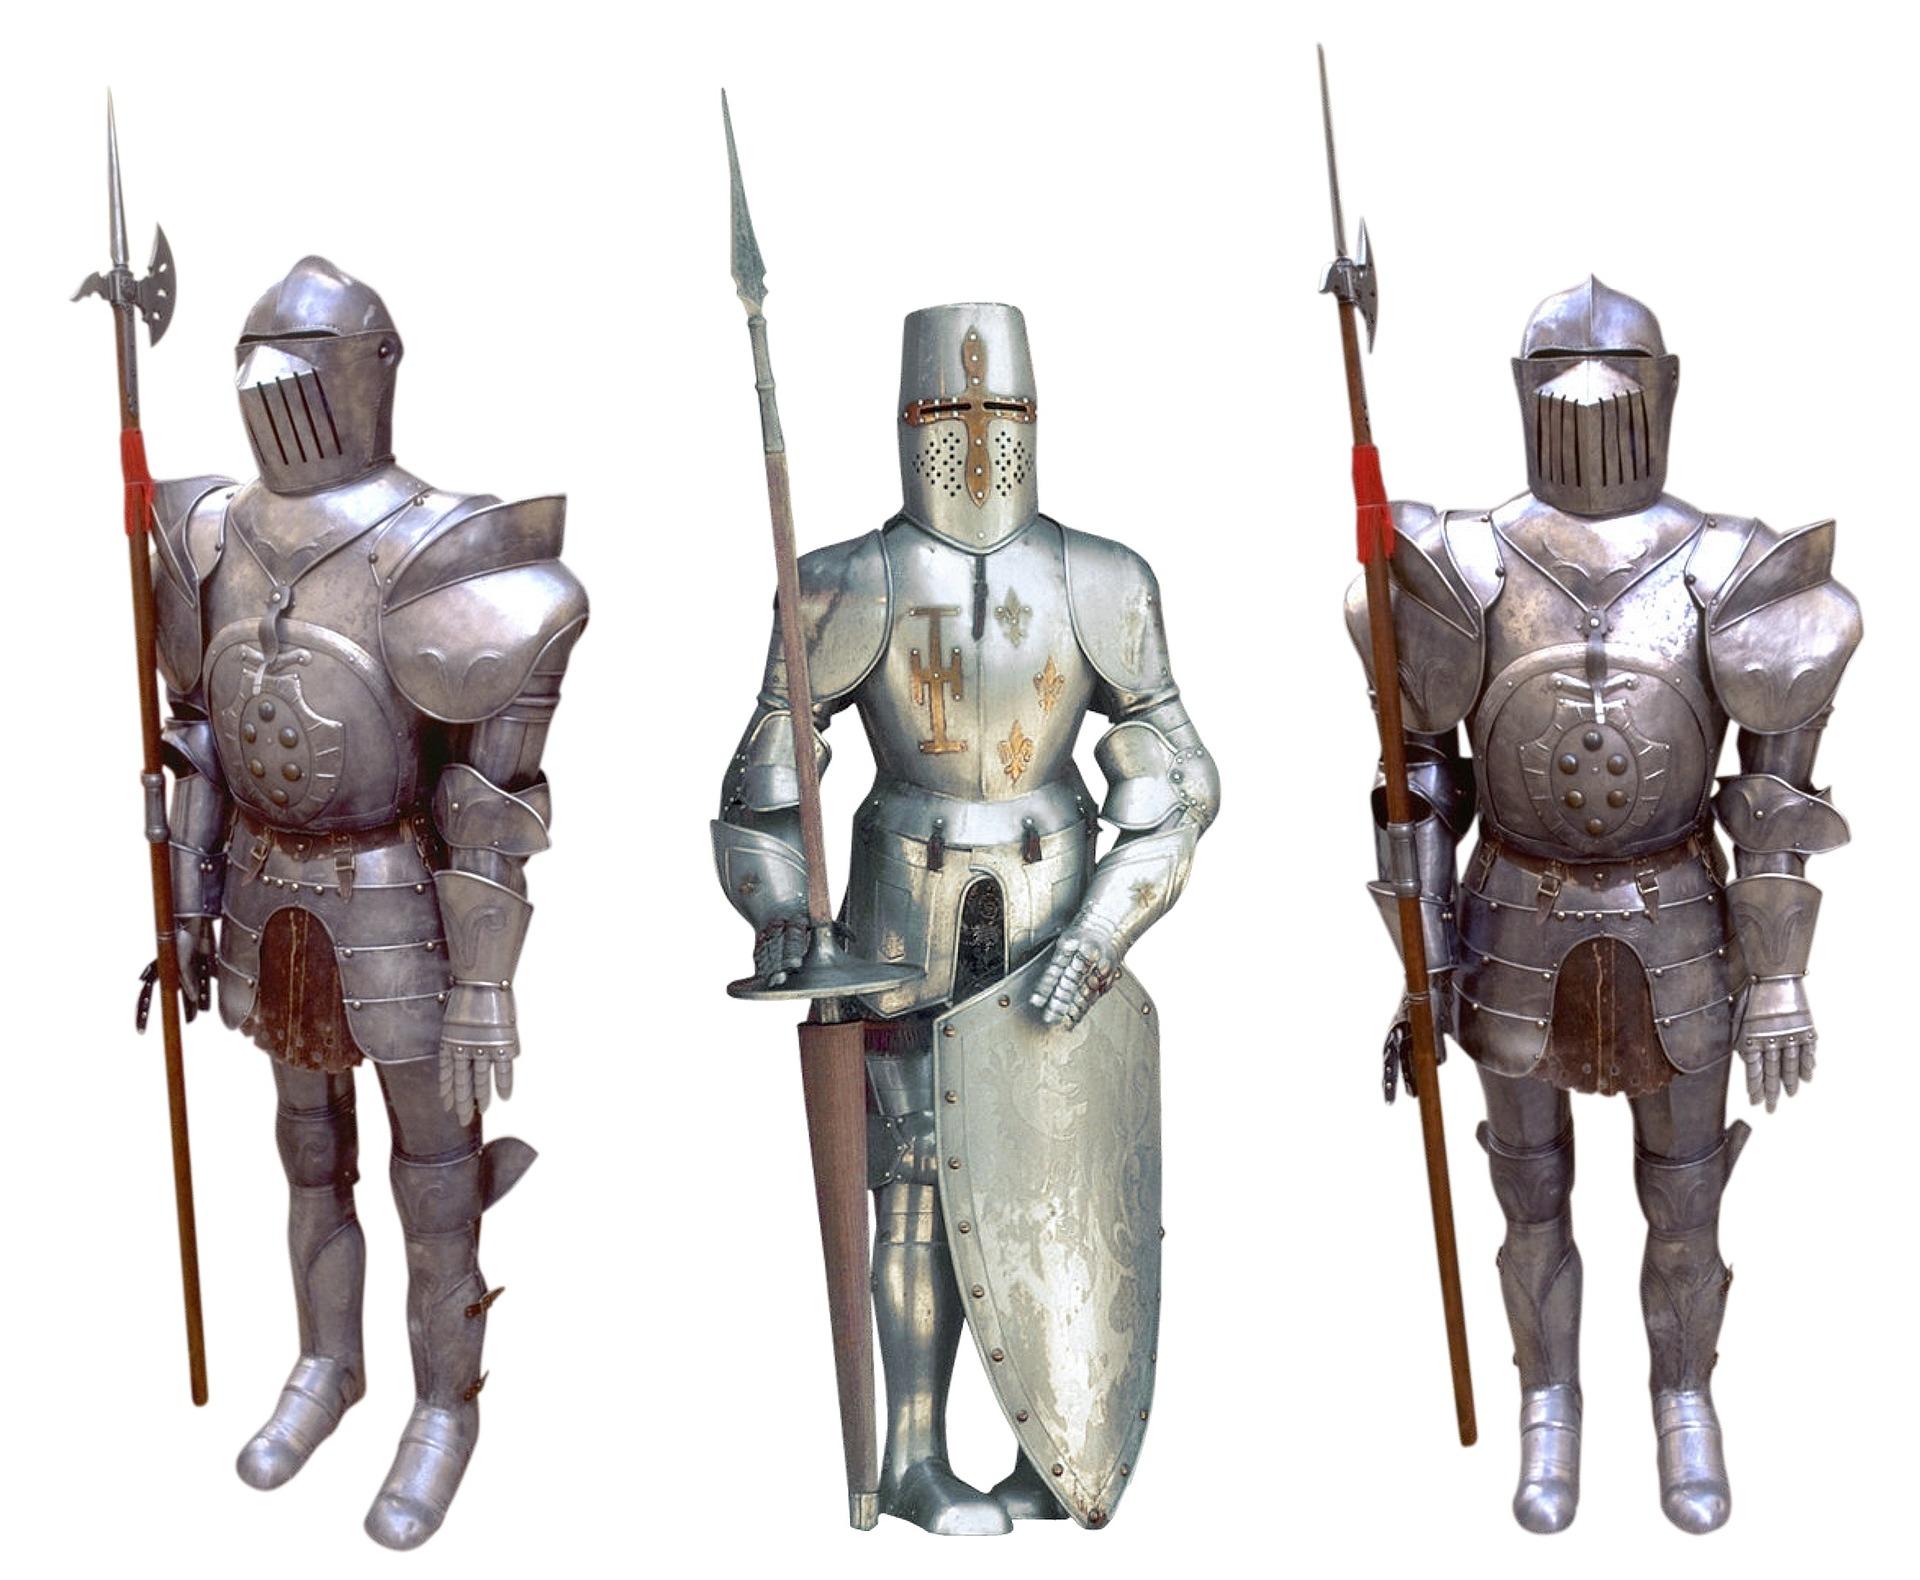 knight-1514302_1920